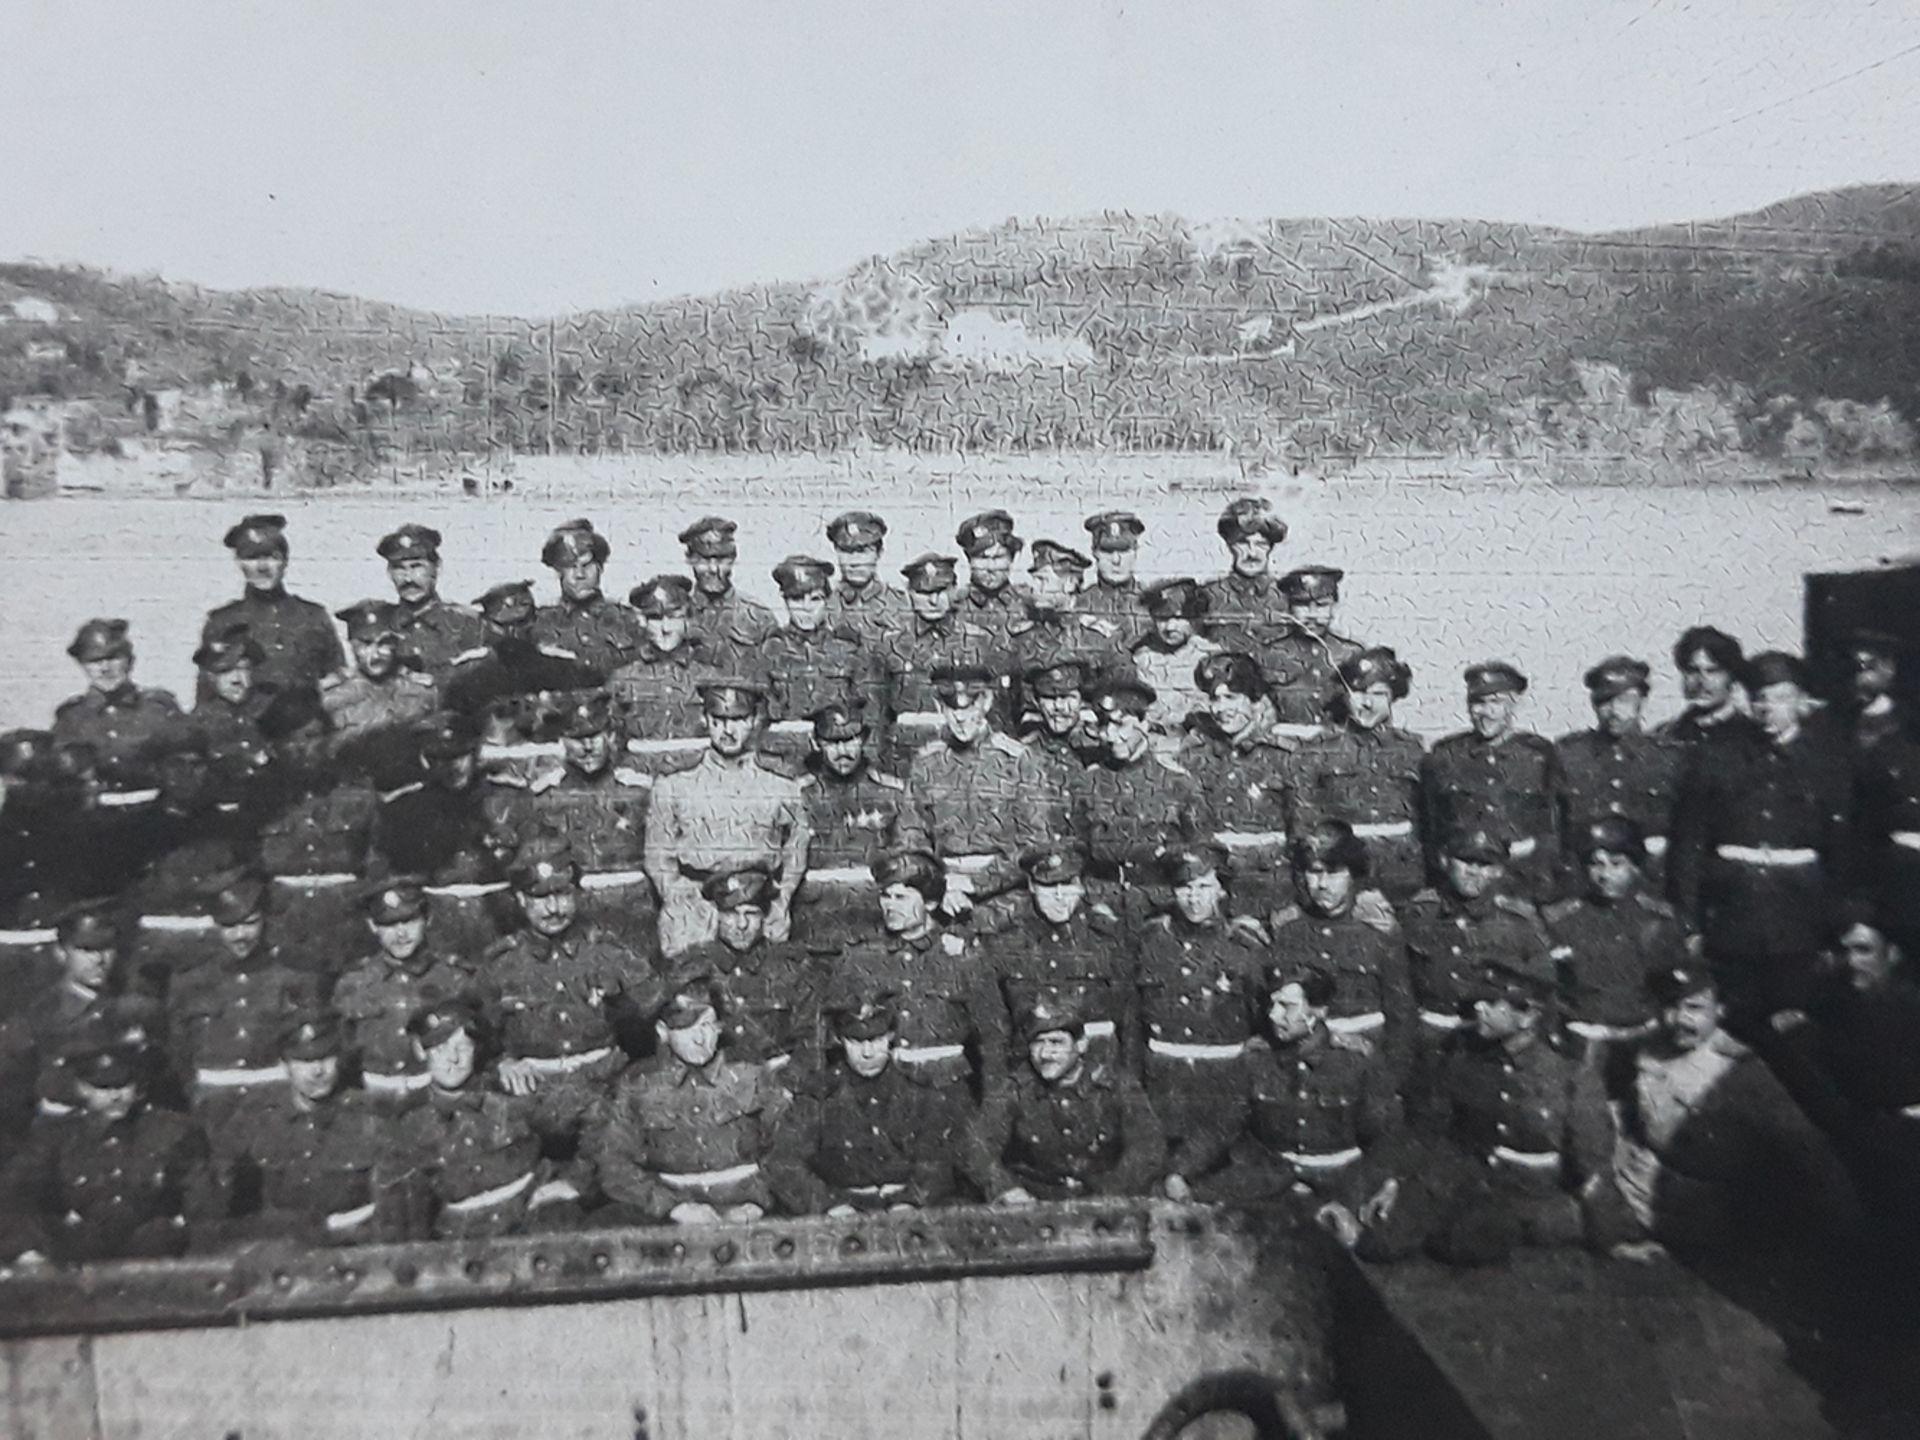 [Soviet]. Forces of Wrangel's South Army. Photograph. Crimea. 1920. 10x7 cm.<br>